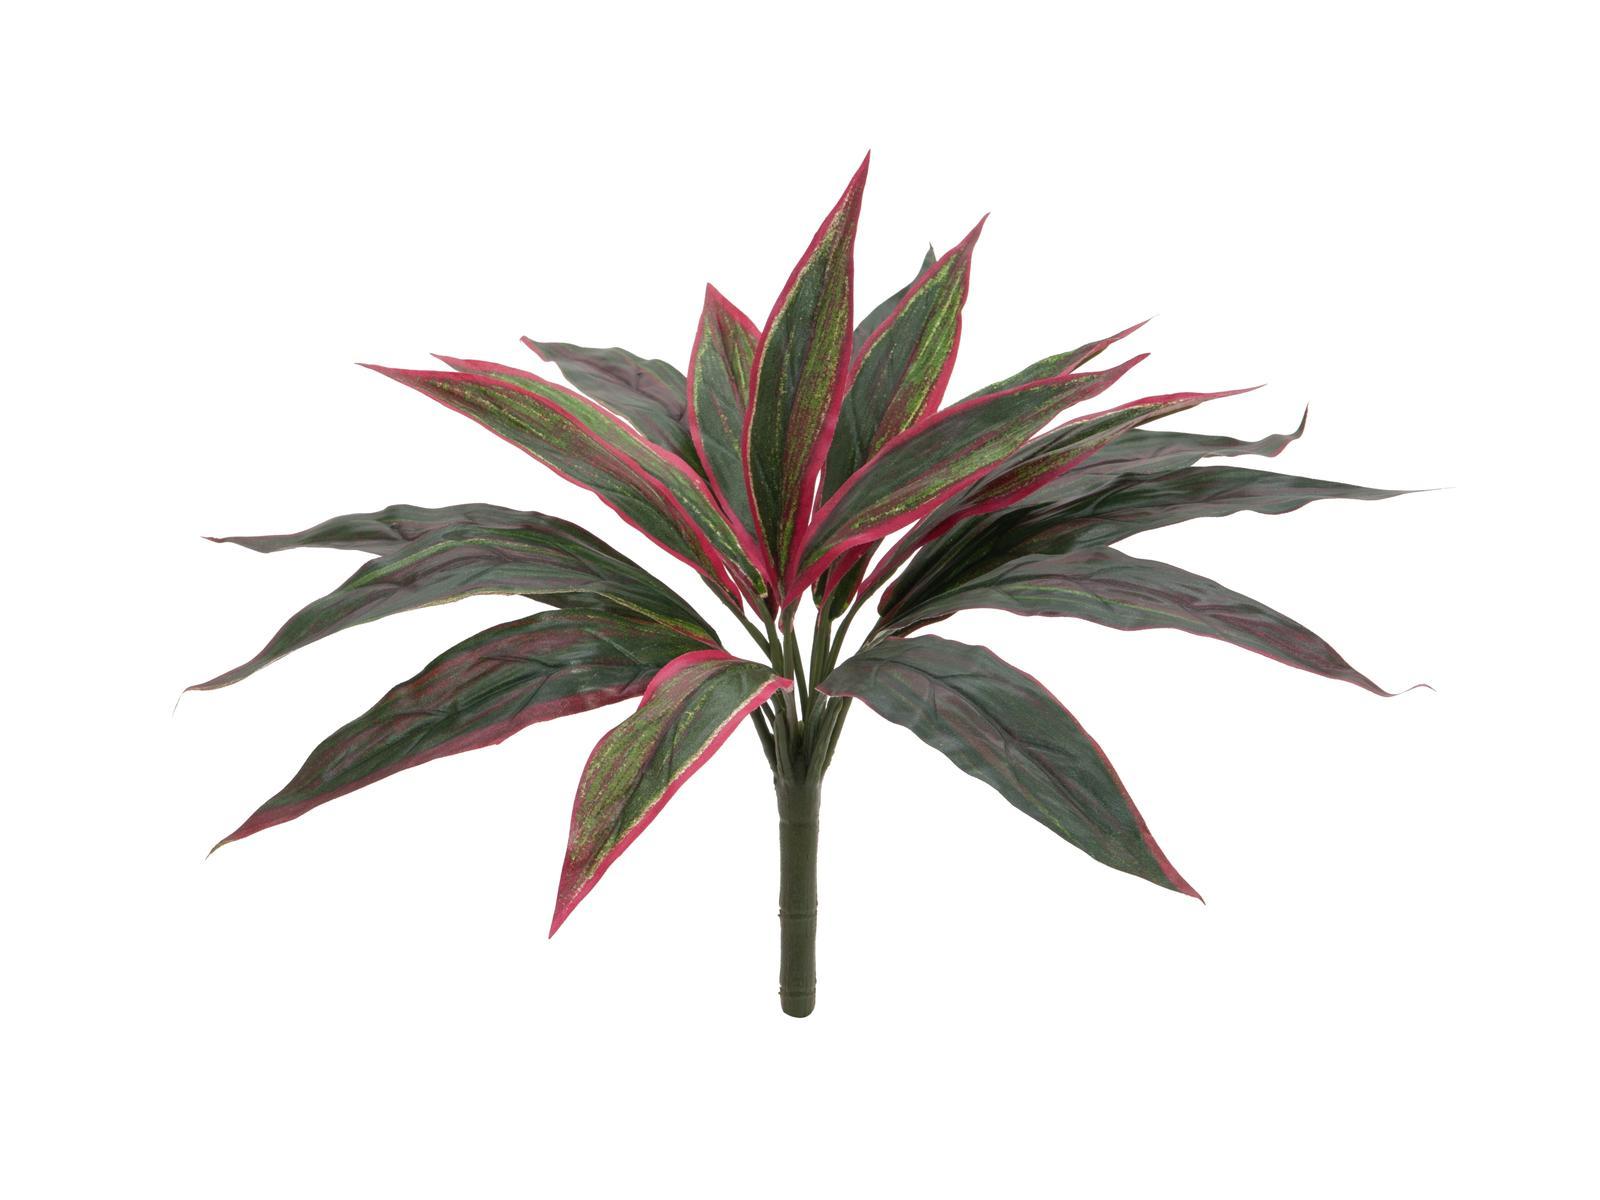 EUROPALMS pianta artificiale Dracena, rosso-verde, 27cm